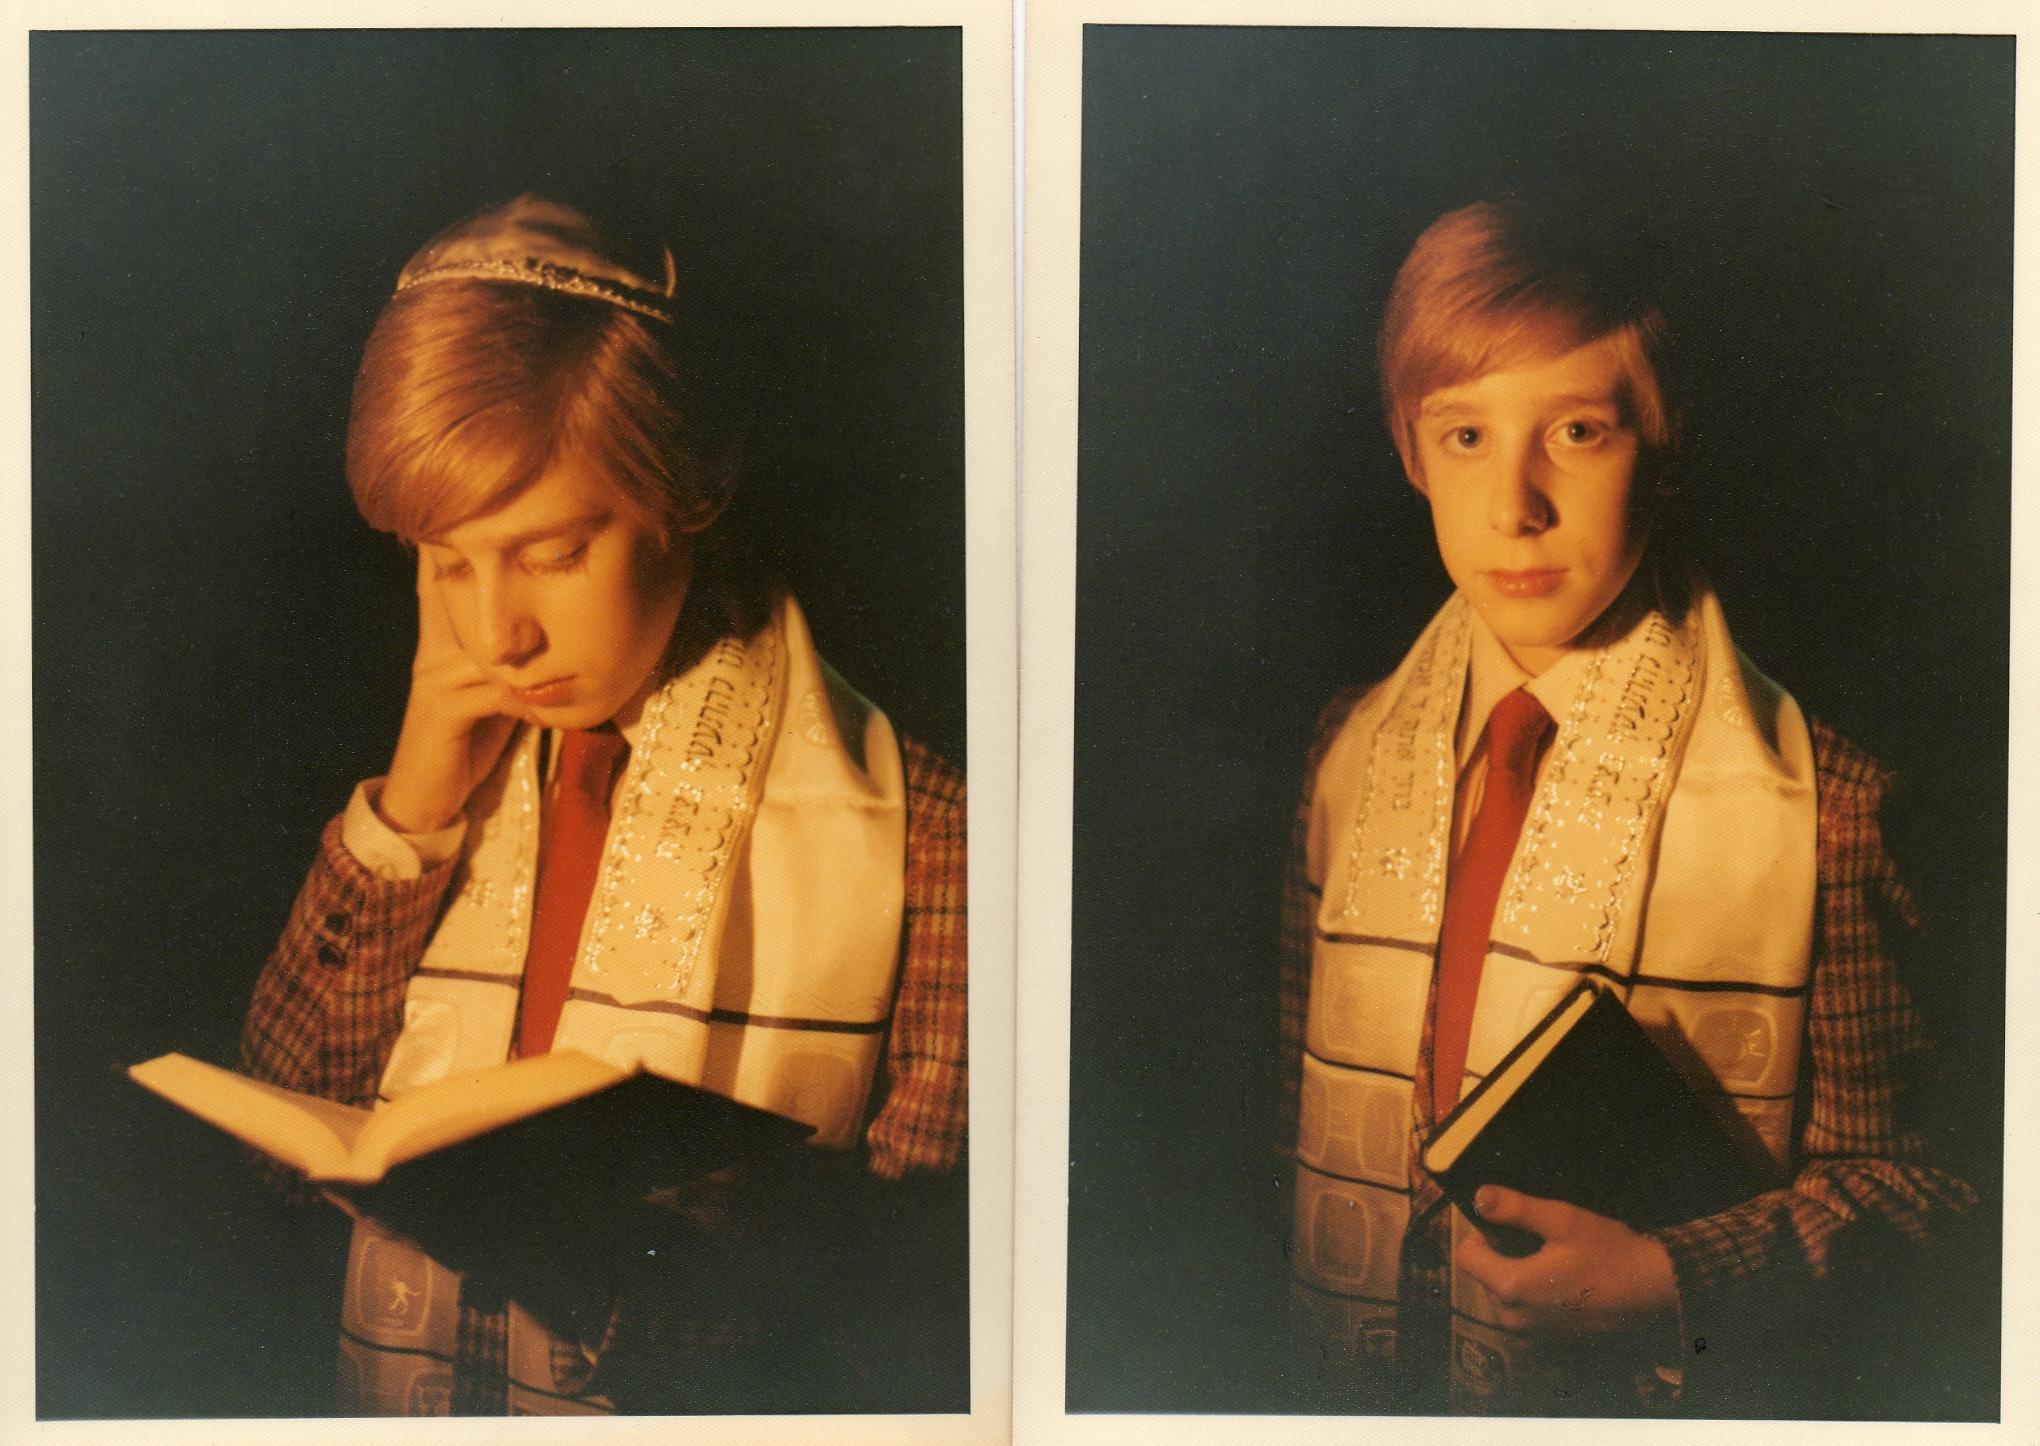 IrwinBarMitzvah1973001.jpeg